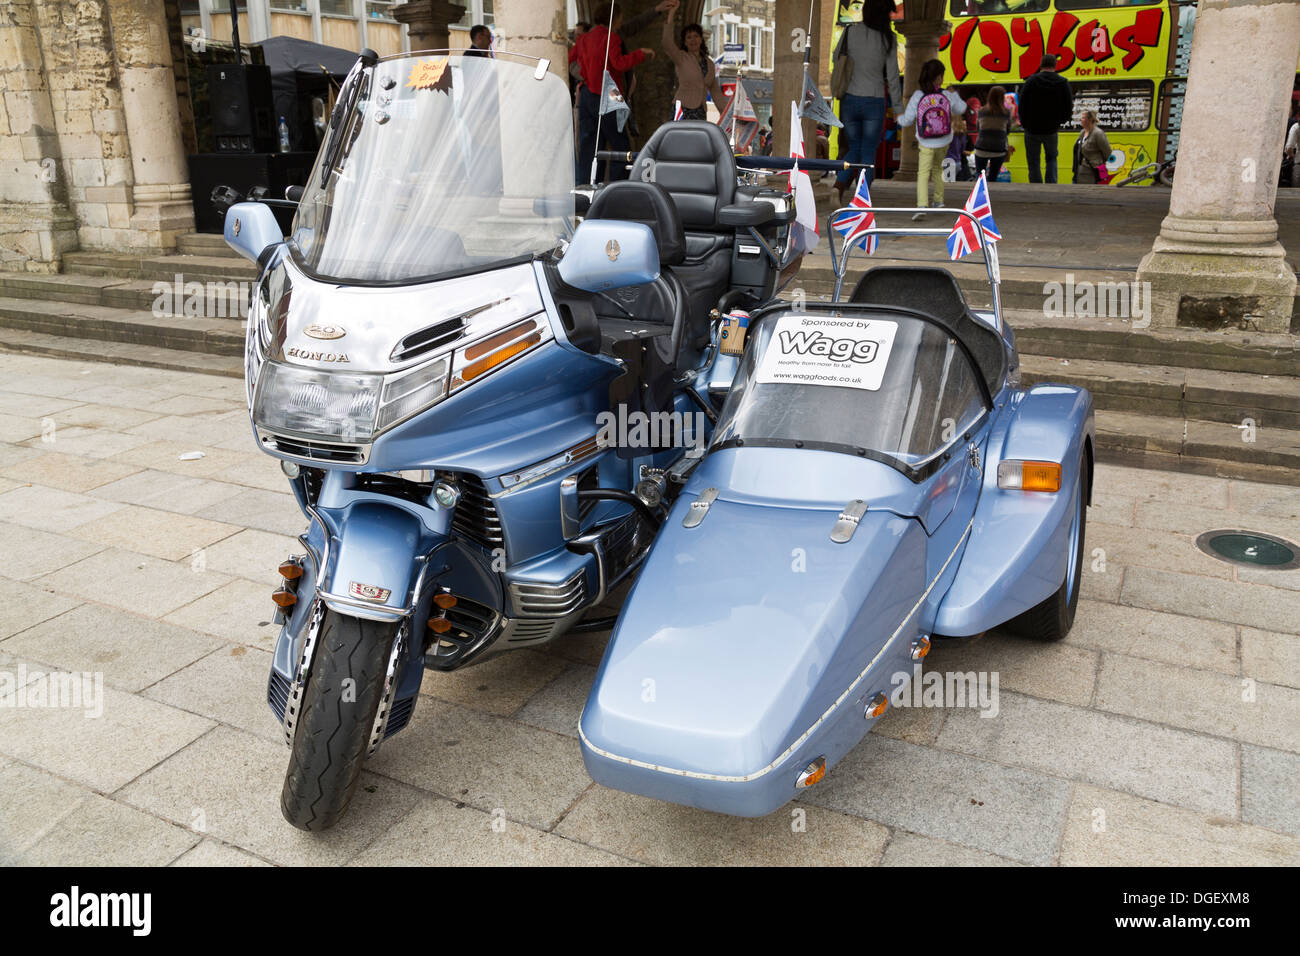 Honda Sidecar Stock Photos & Honda Sidecar Stock Images - Alamy